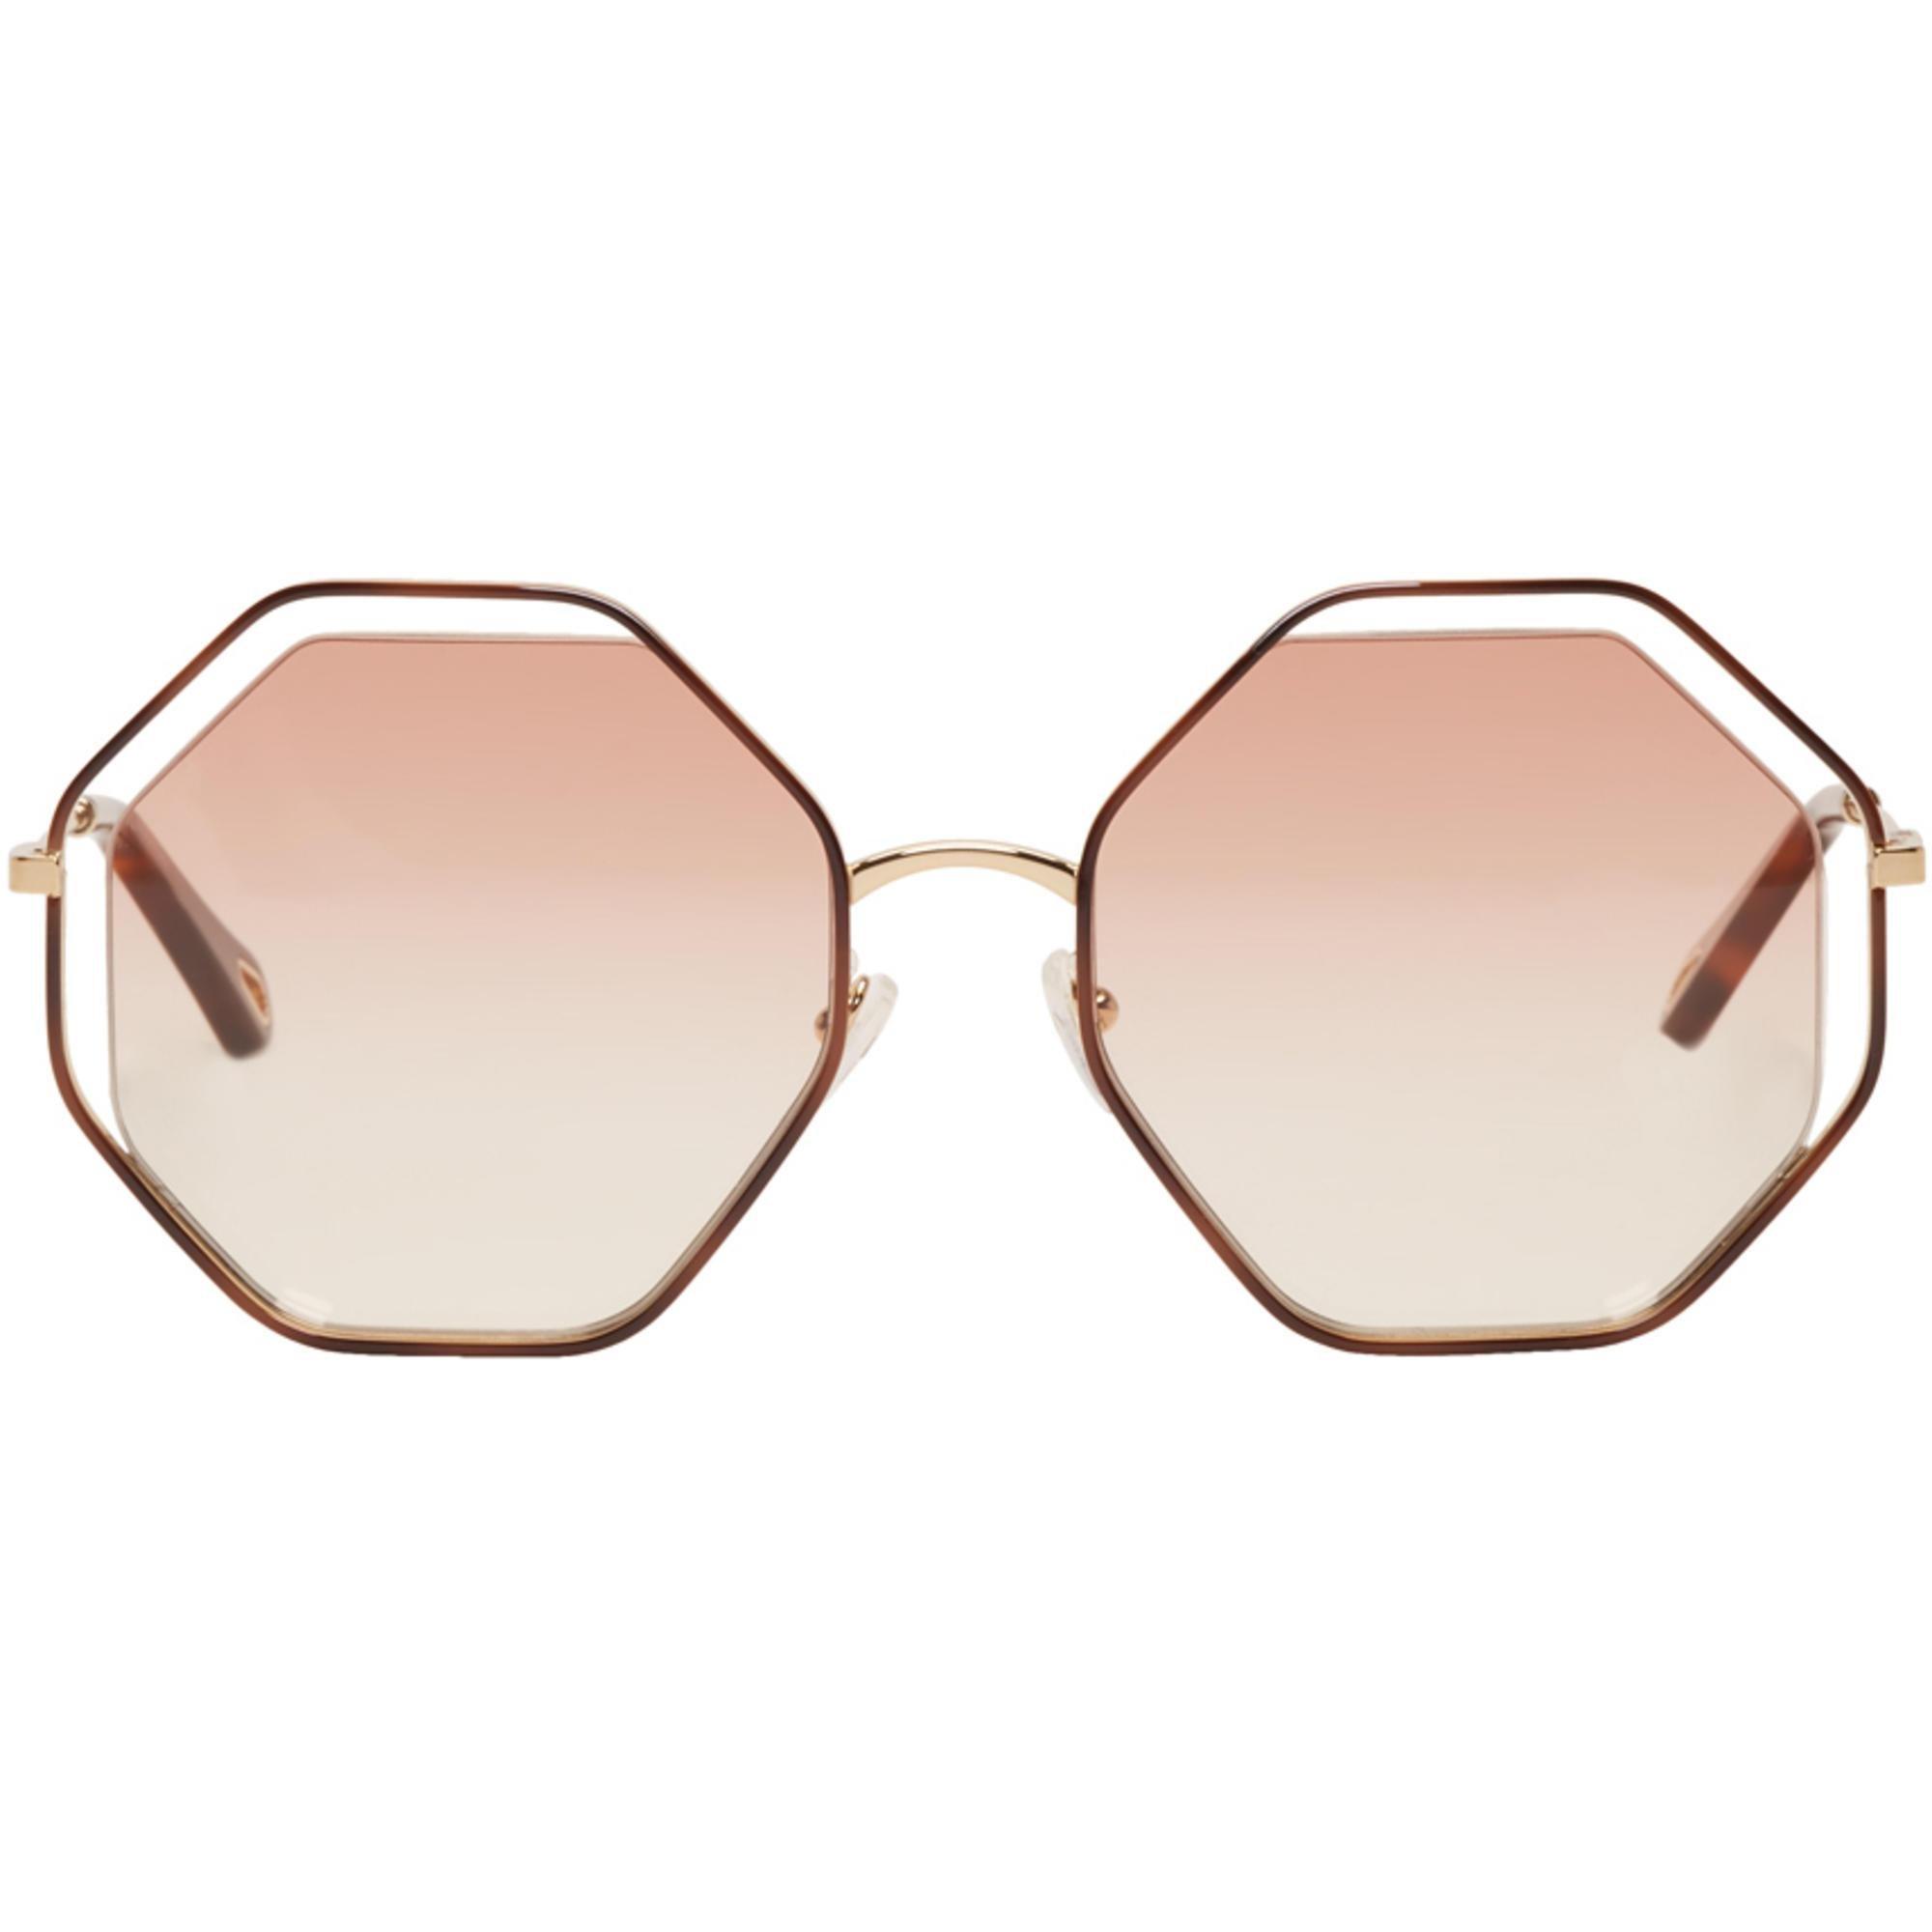 Chloé Gold & Off-White Hexagon Sunglasses fWLDqSmMP